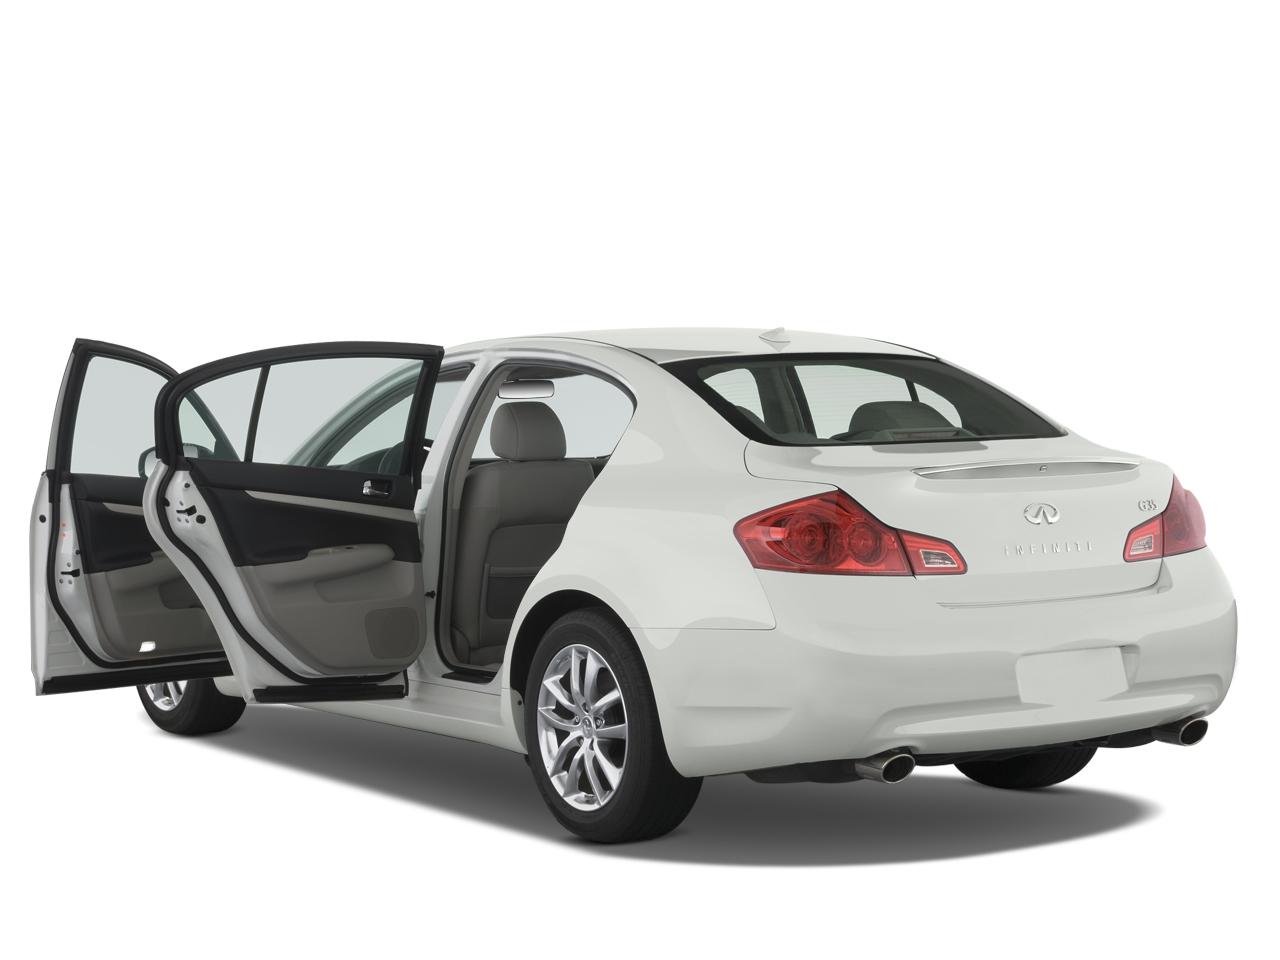 Infiniti infiniti g35 specs : 2008 Infiniti G35xS - Infiniti Luxury Sedan Review - Automobile ...